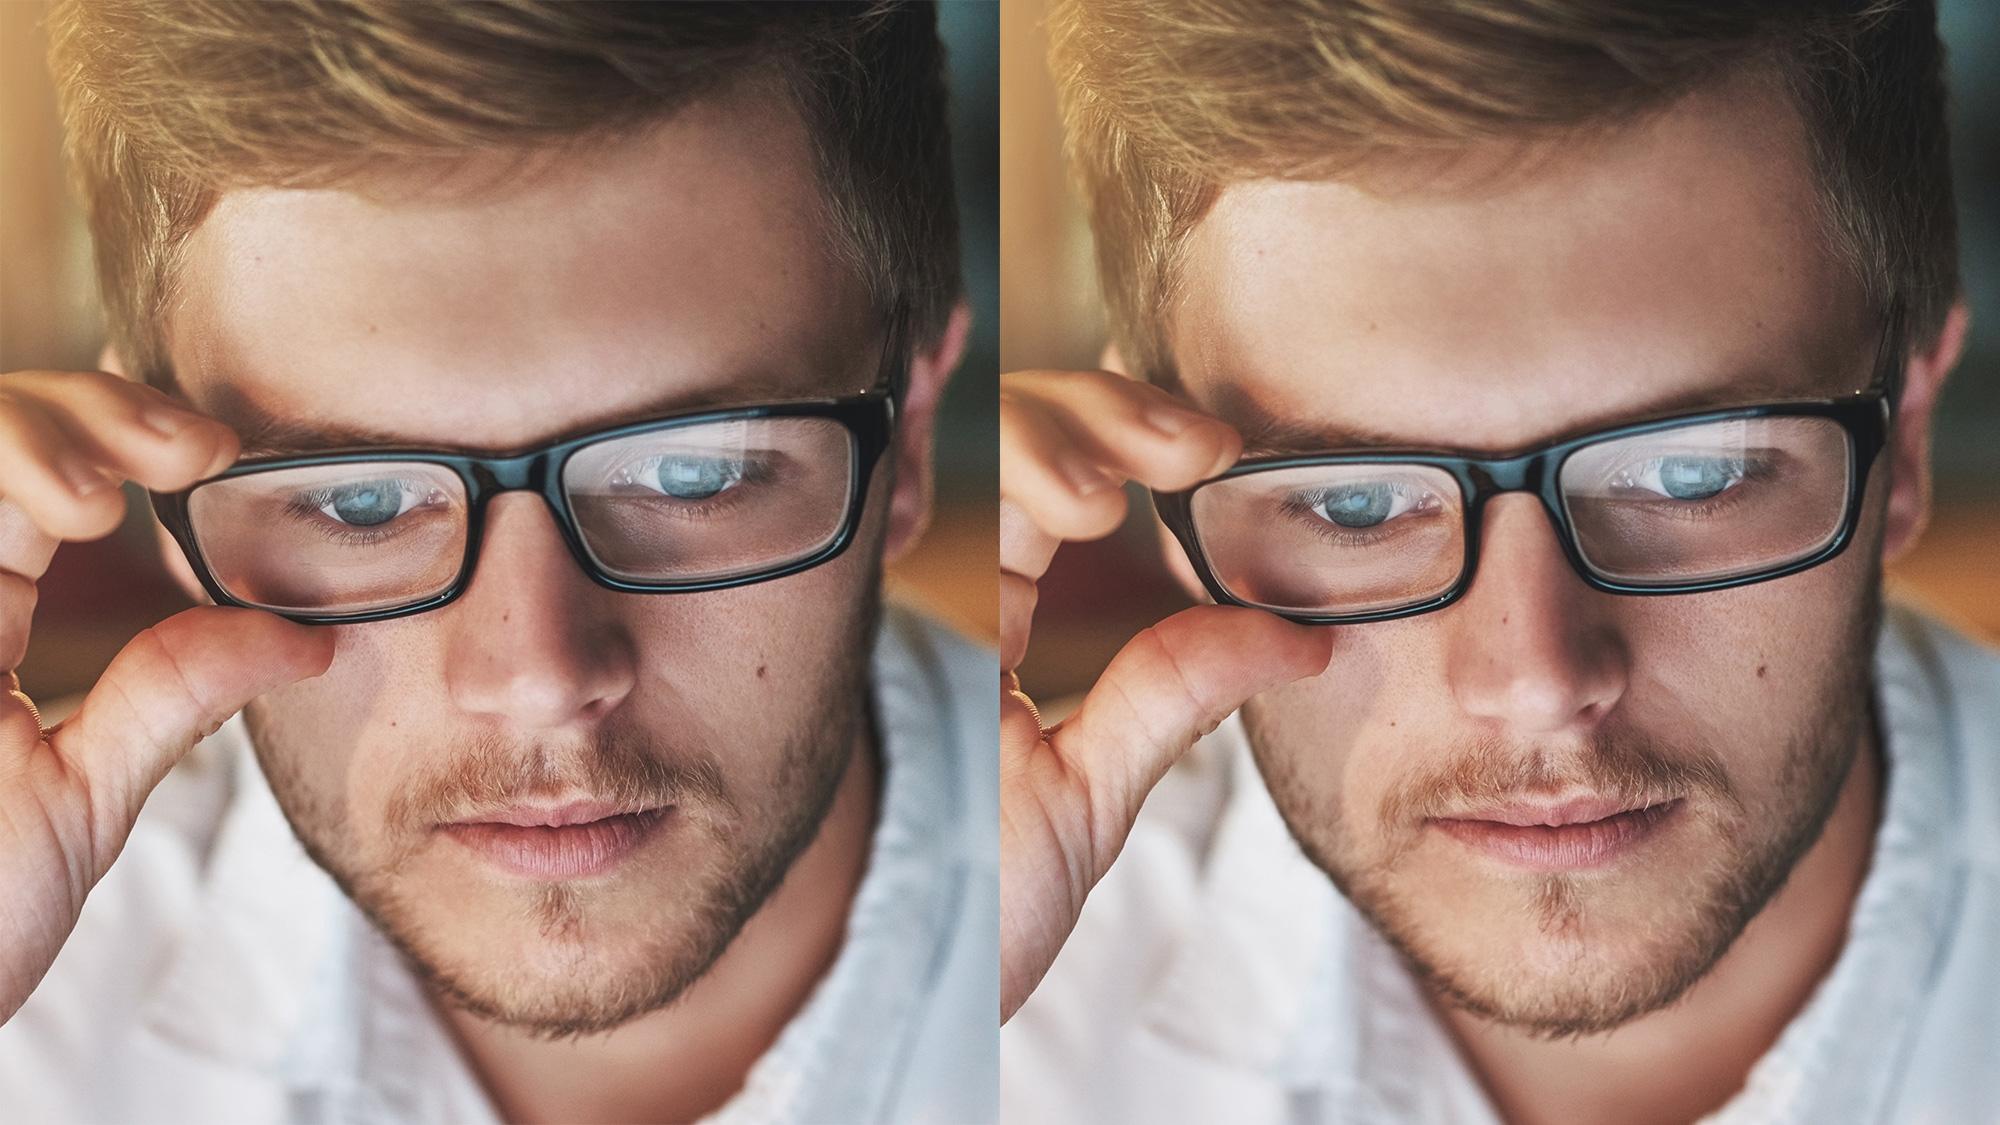 Novo protótipo da Adobe usa inteligência artificial para identificar rostos modificados pelo Photoshop